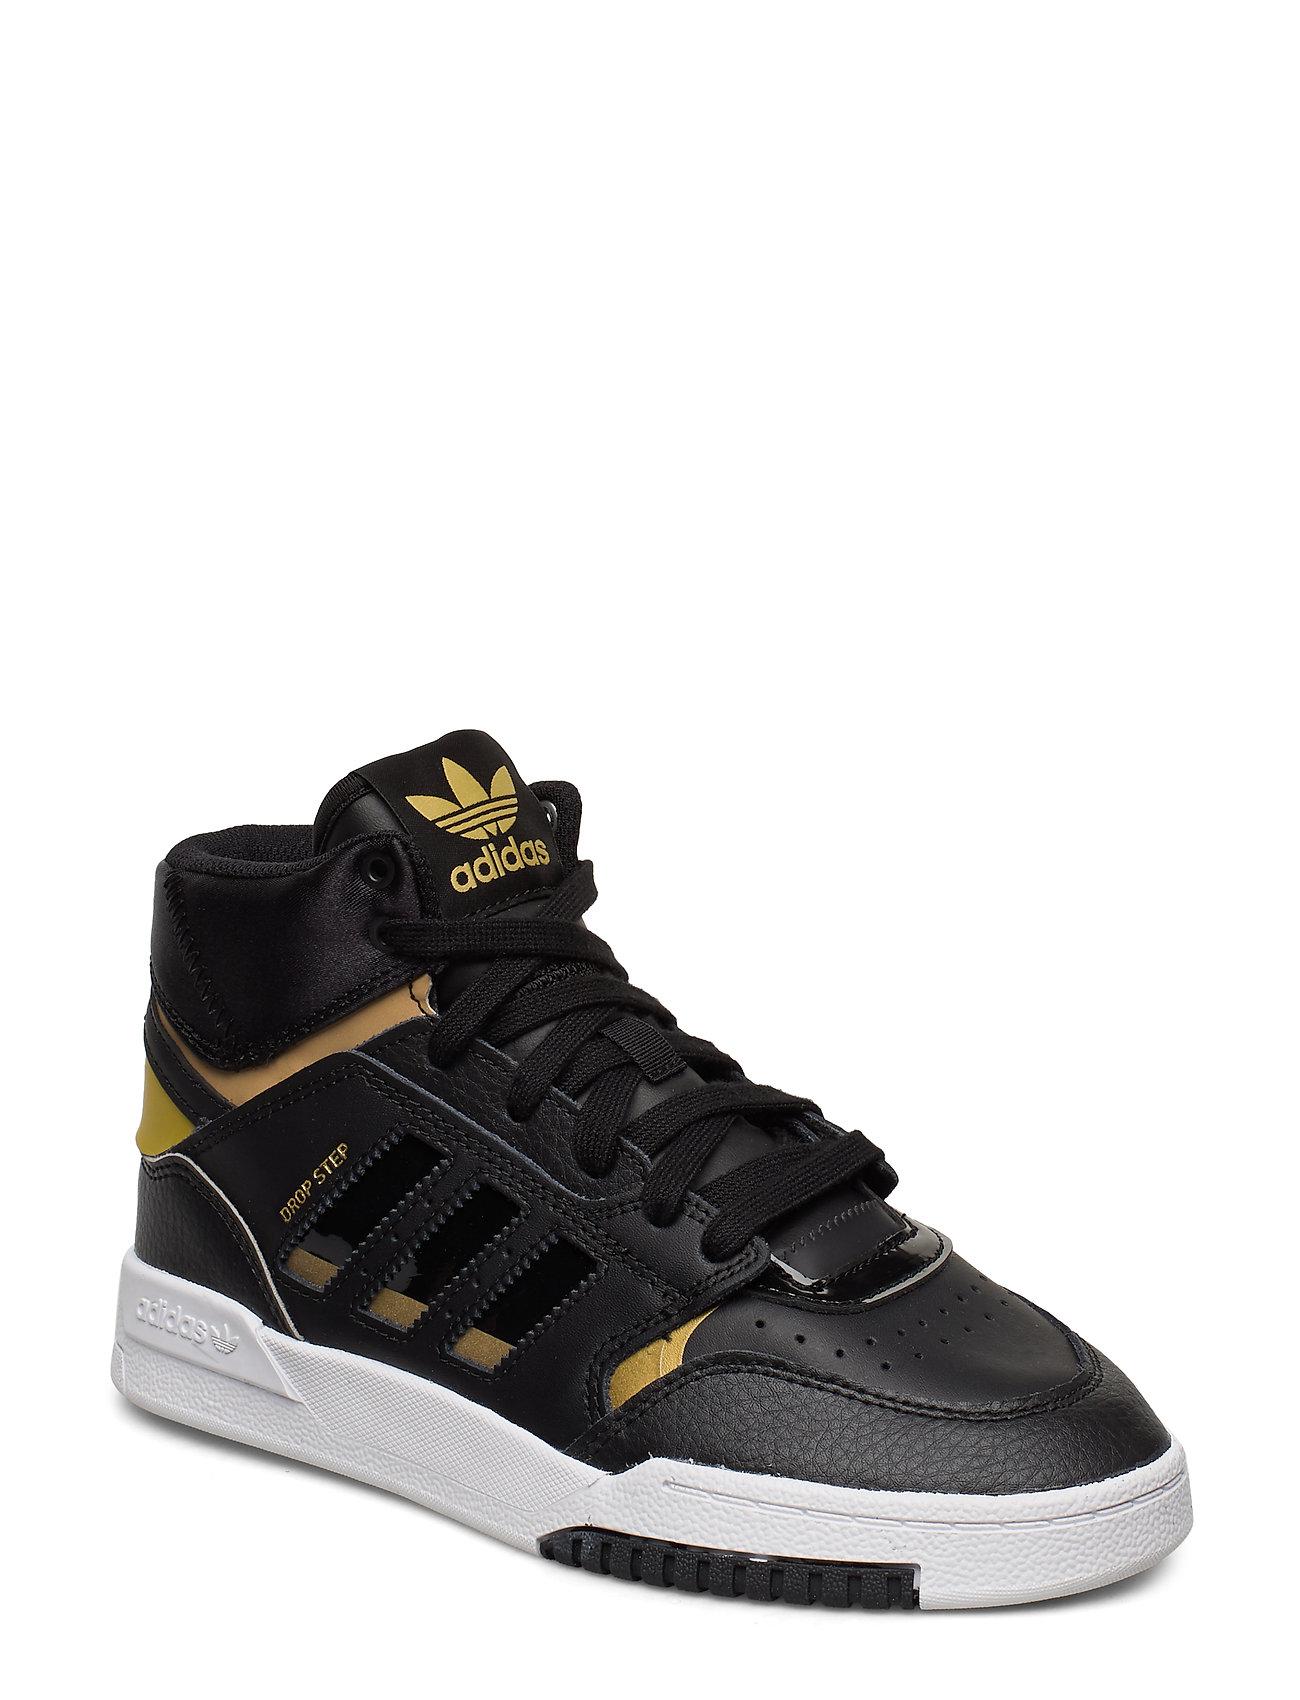 adidas Originals DROP STEP J - CBLACK/GOLDMT/FTWWHT